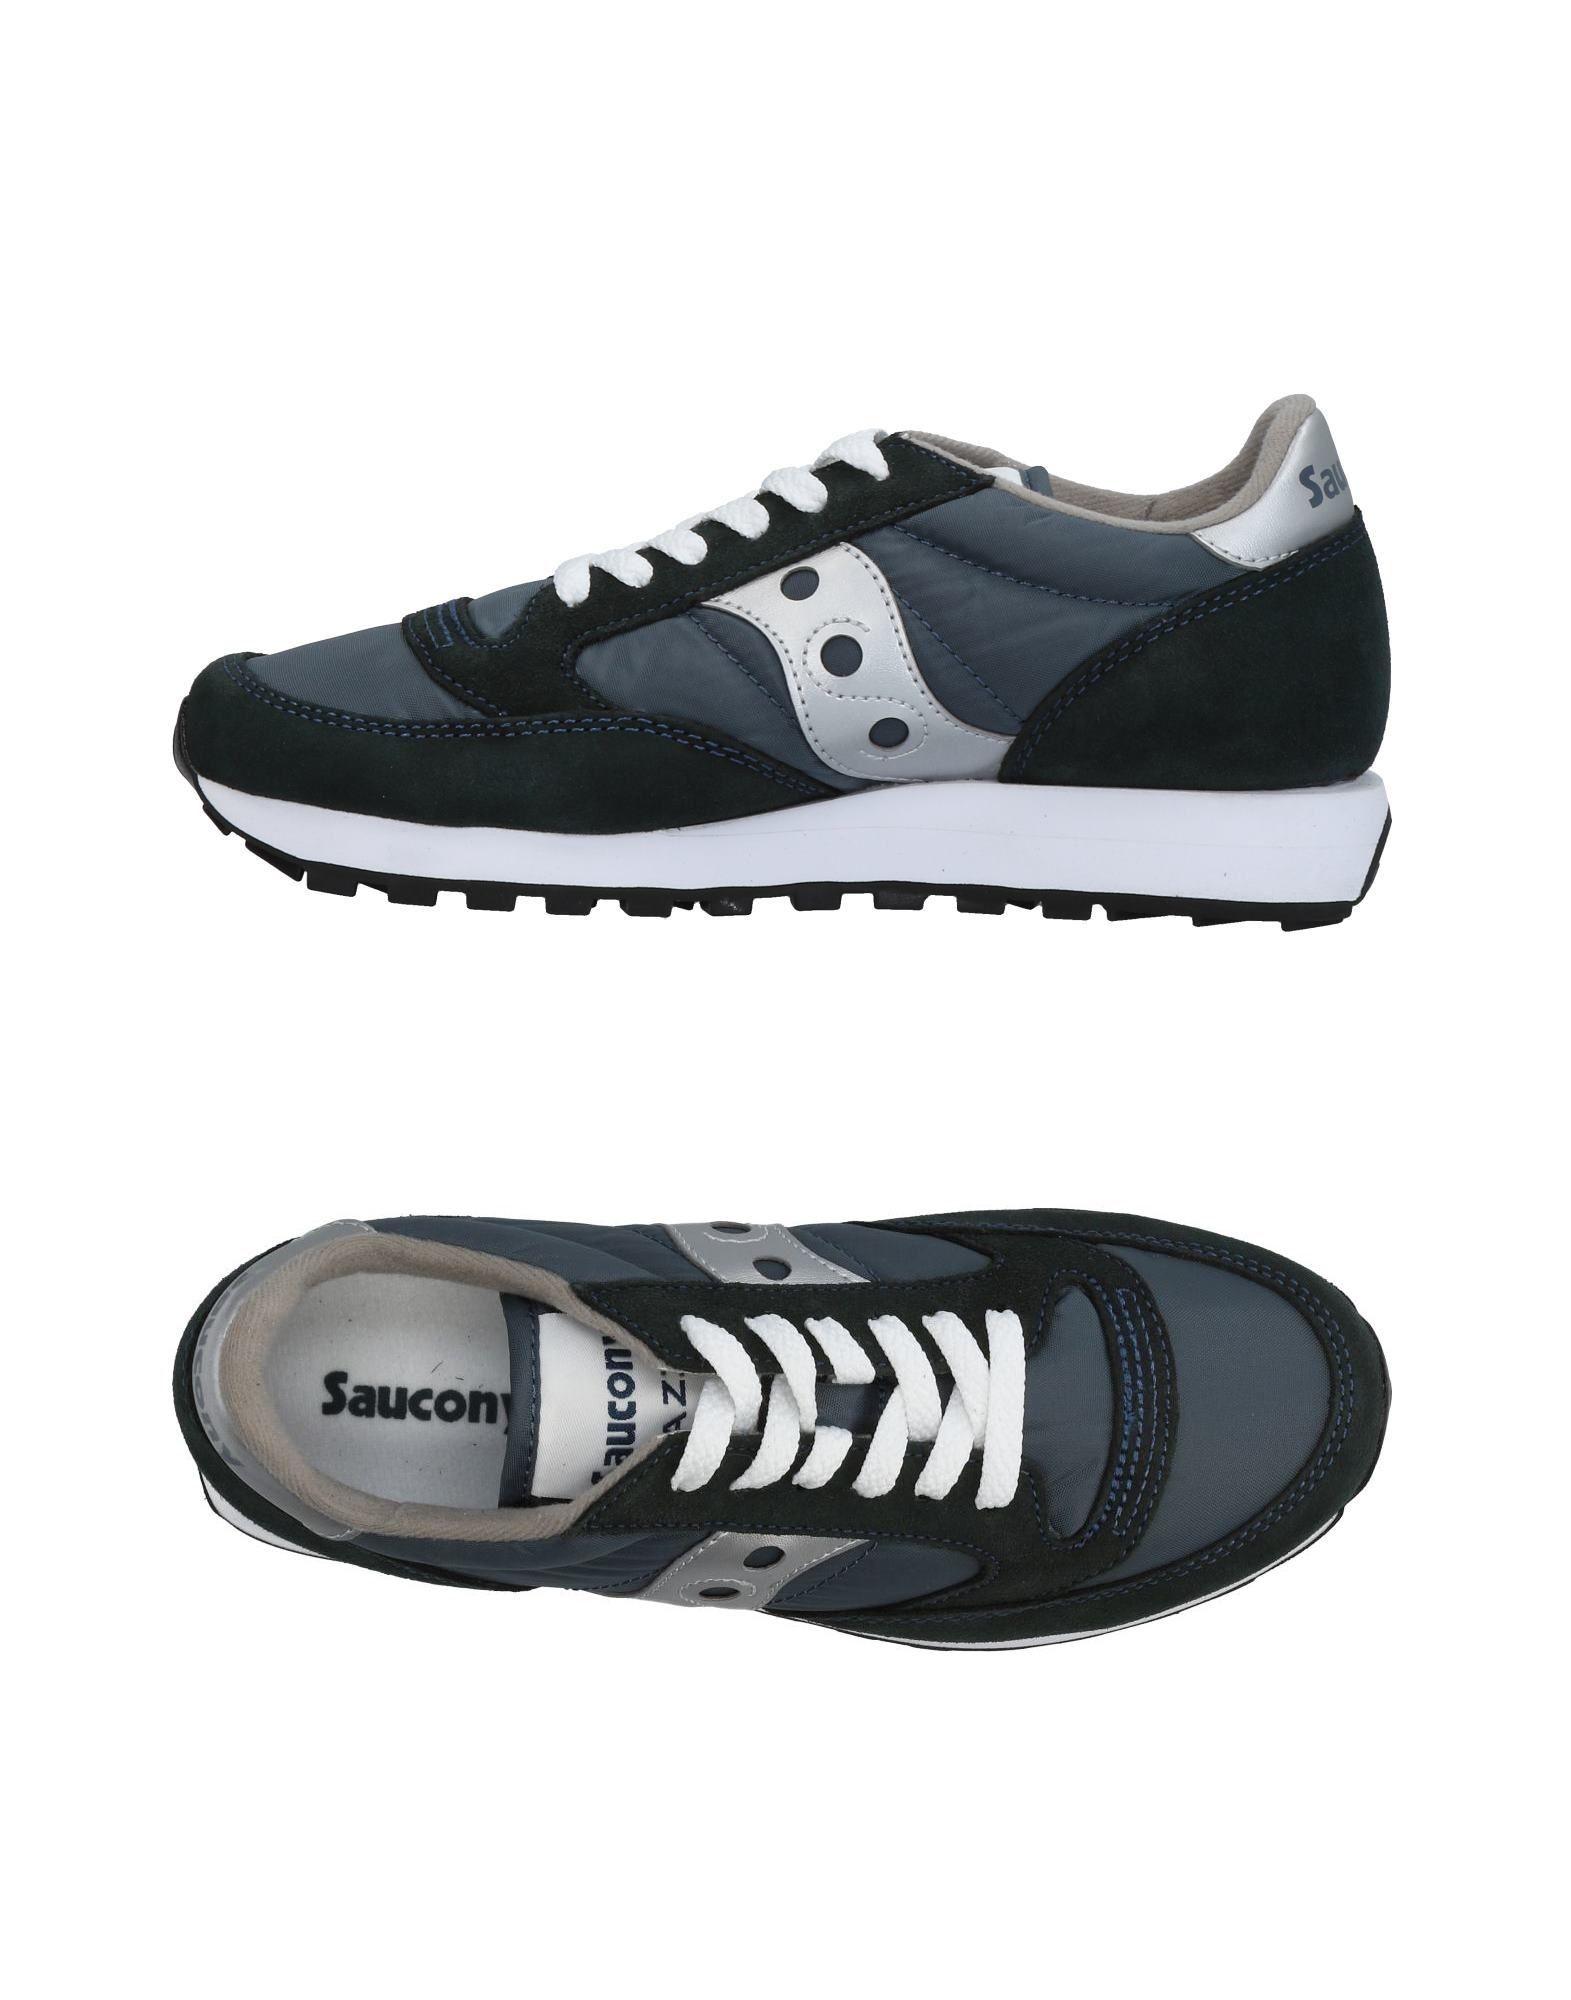 Saucony Gute Sneakers Damen  11446186XM Gute Saucony Qualität beliebte Schuhe e4700a